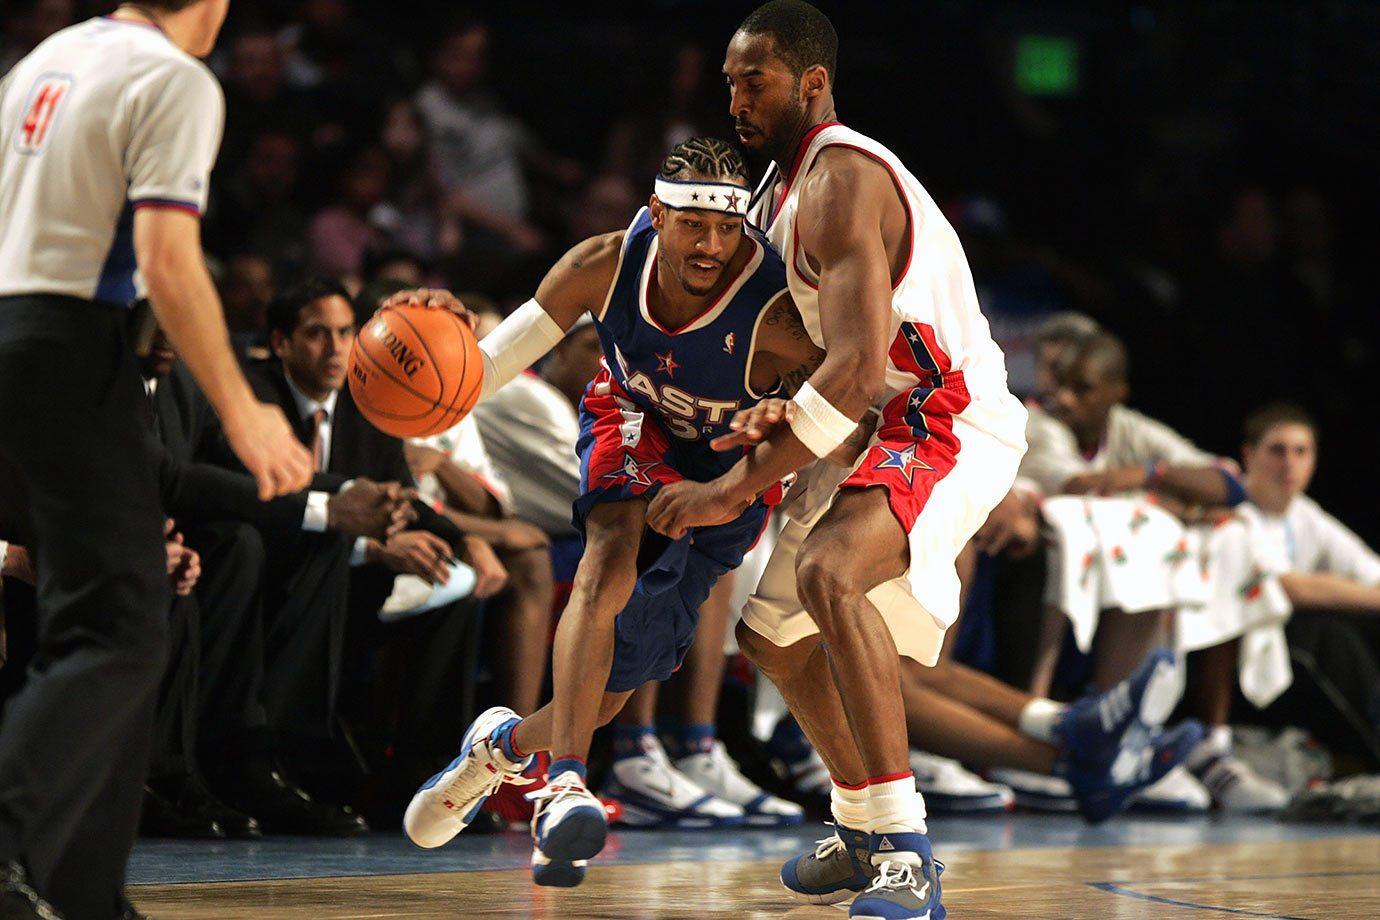 Все кроссовки Аллена Айверсона на Матчах Всех Звезд НБА #Slamdunk.kicks